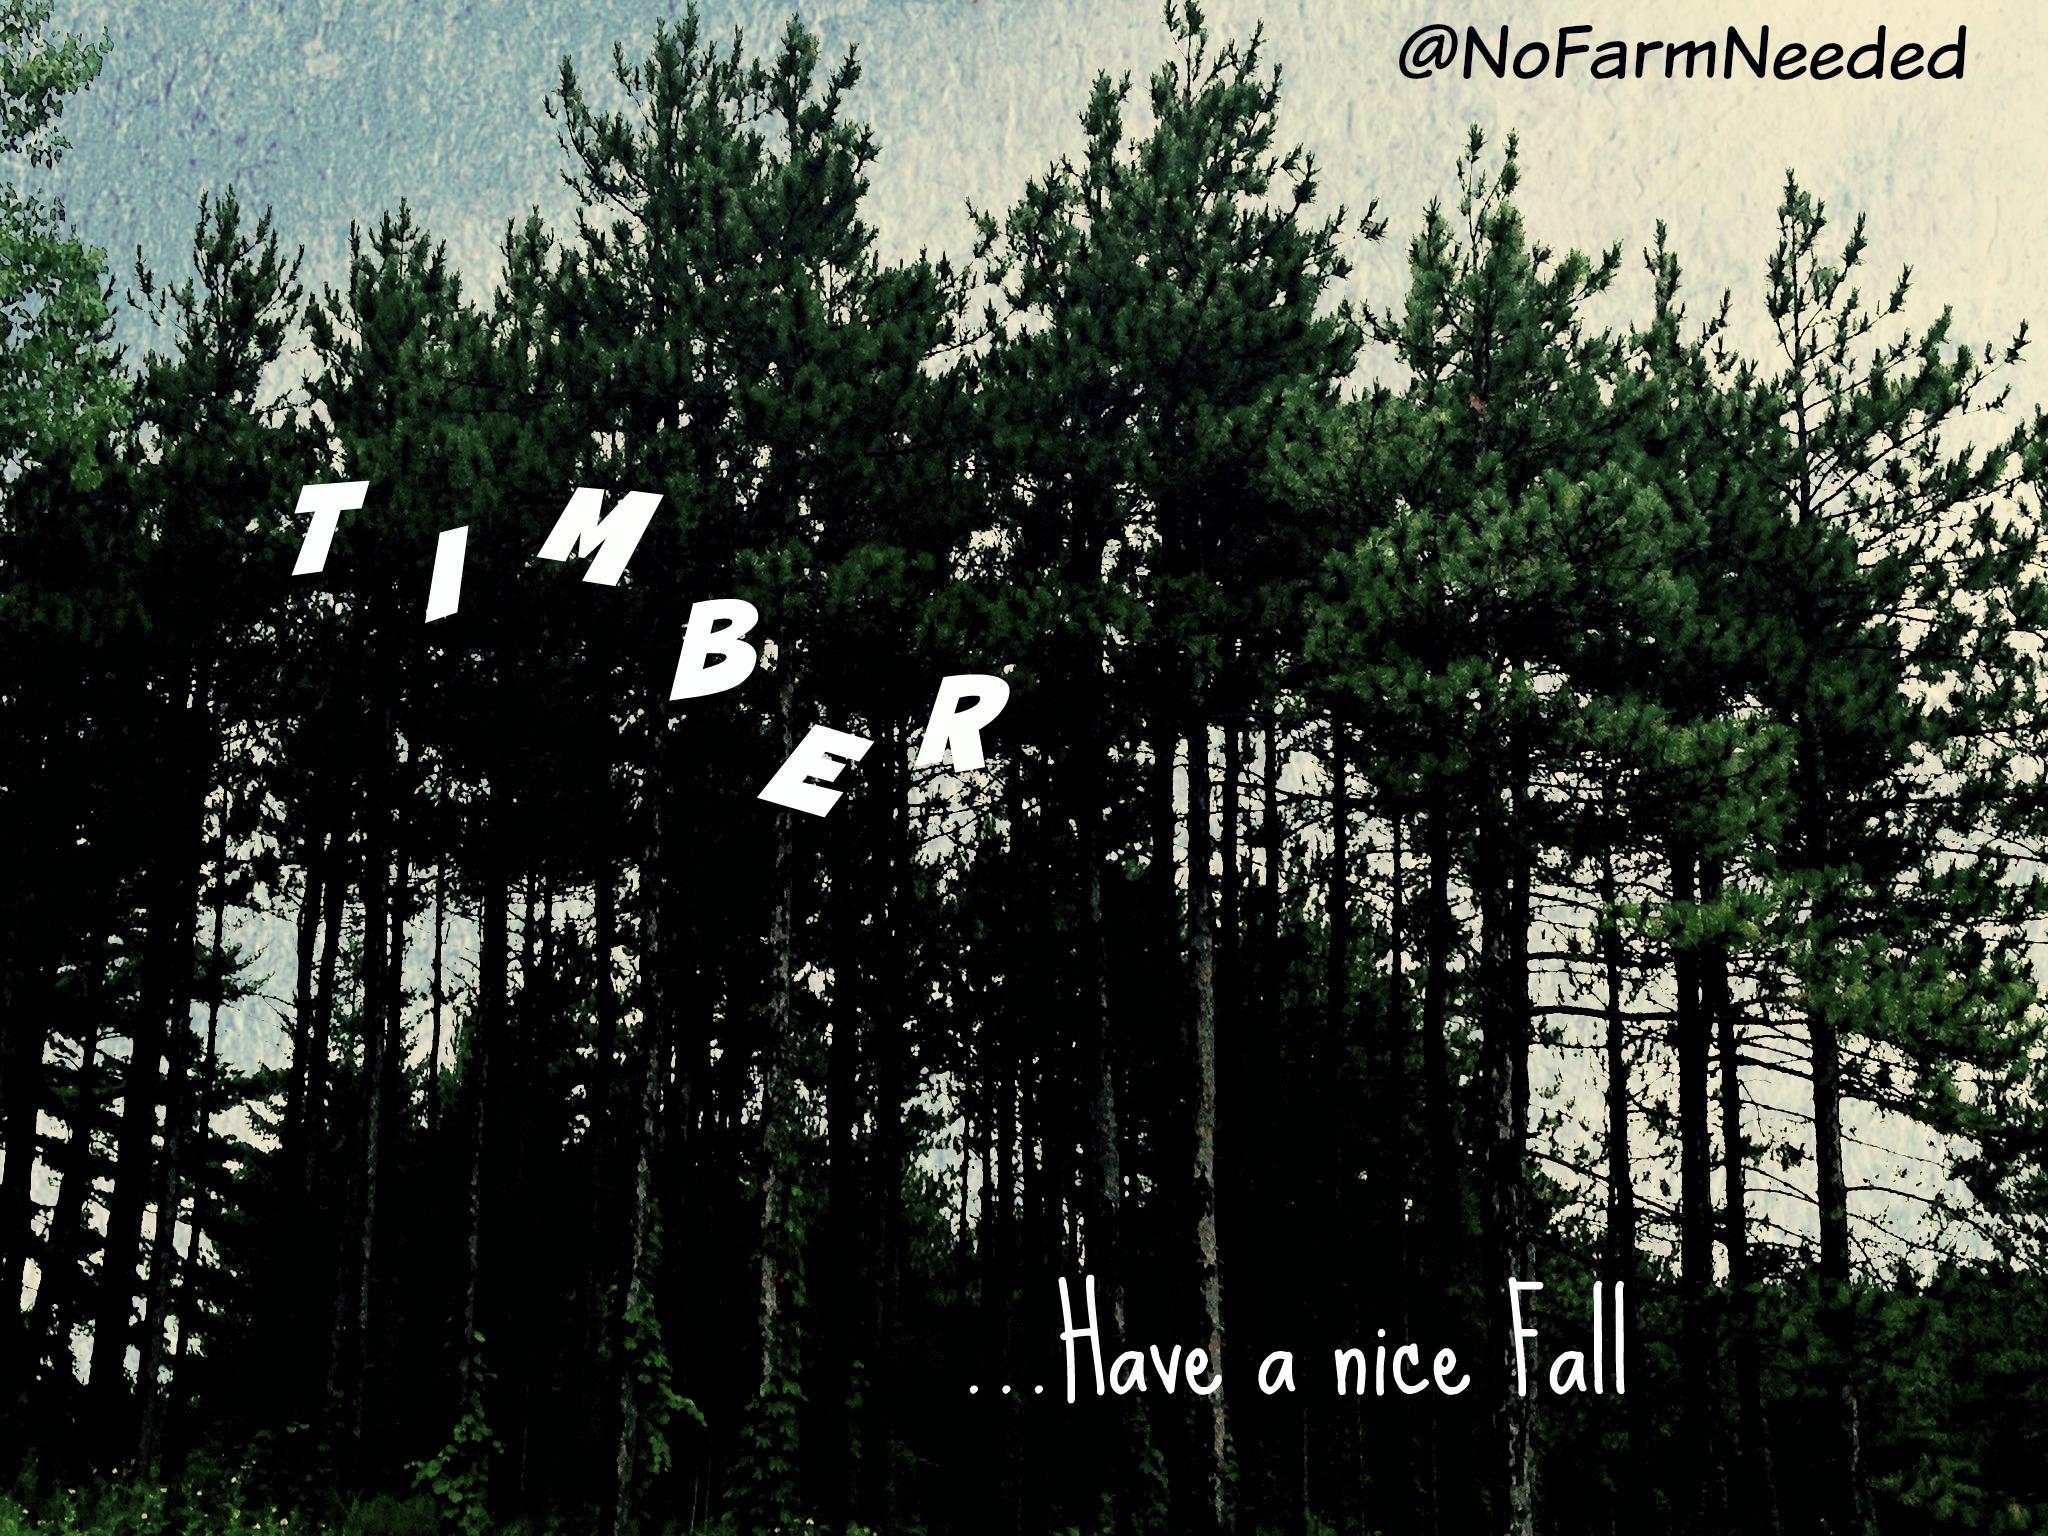 NoFarmNeeded_Arborist 101